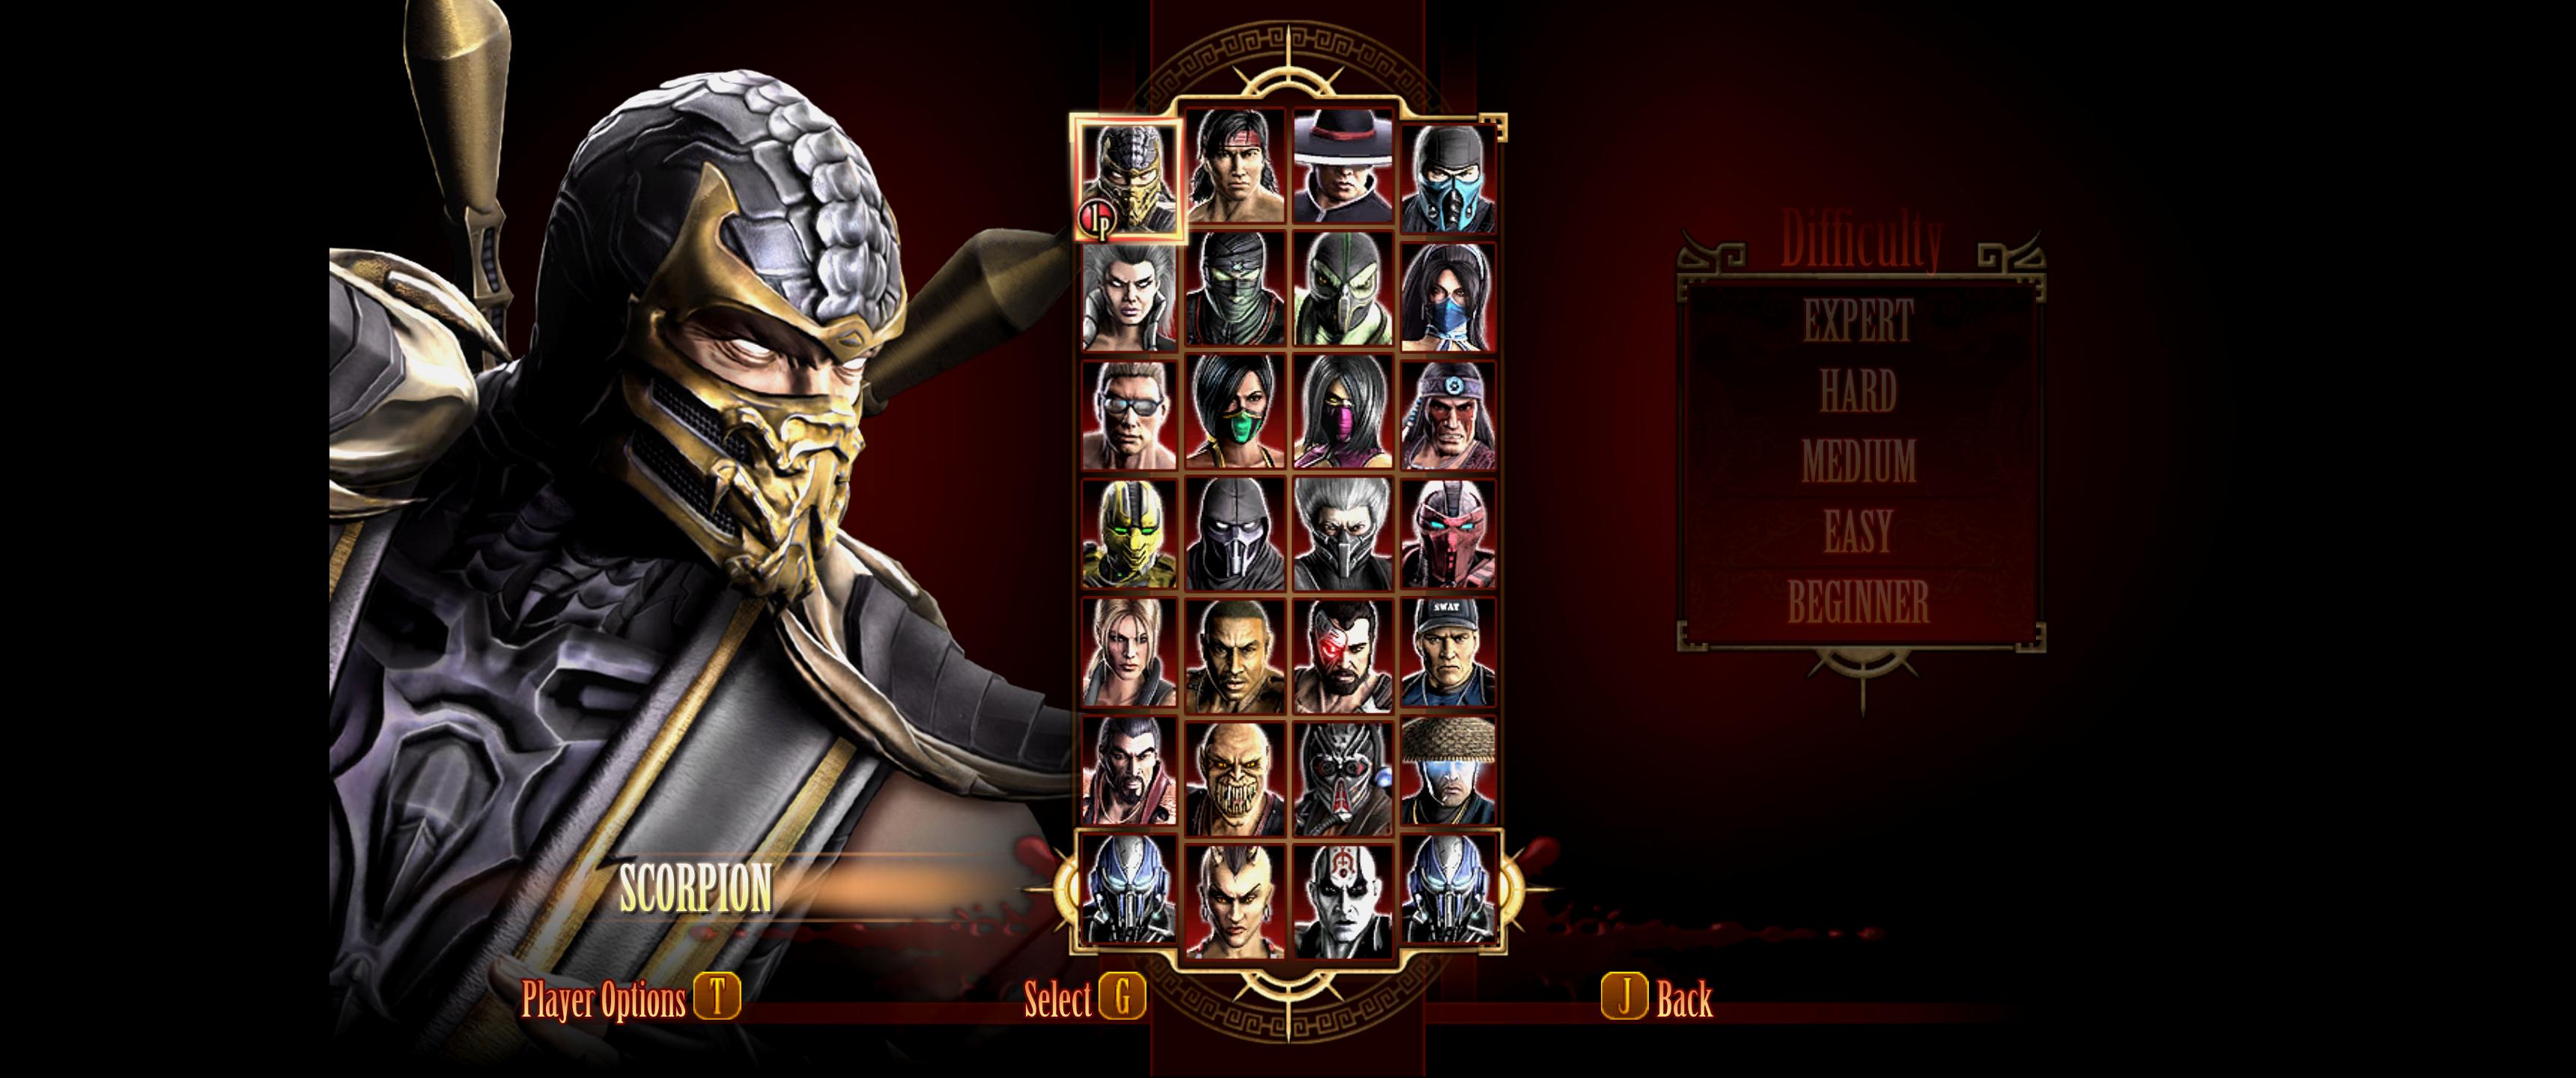 Mortal Kombat 9 characters #MK9 #MKKE | Mortal Kombat | Mortal